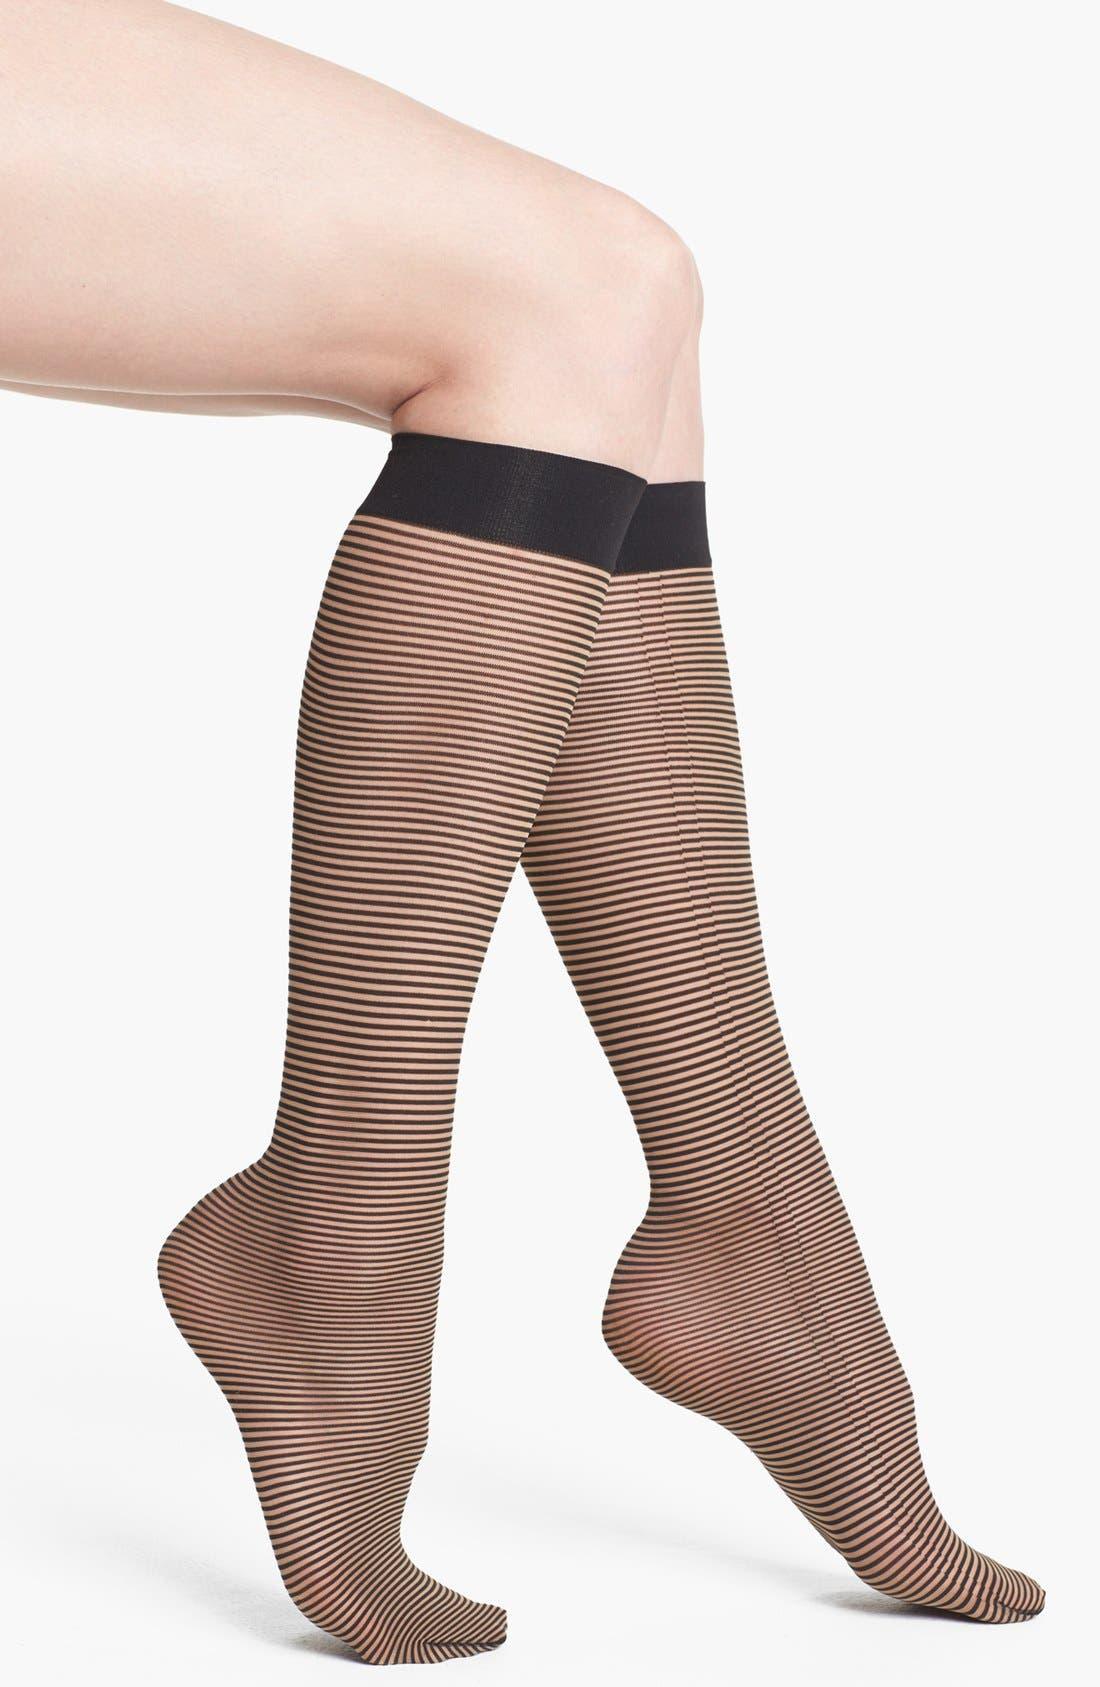 Main Image - Wolford 'Rayure' Knee High Socks